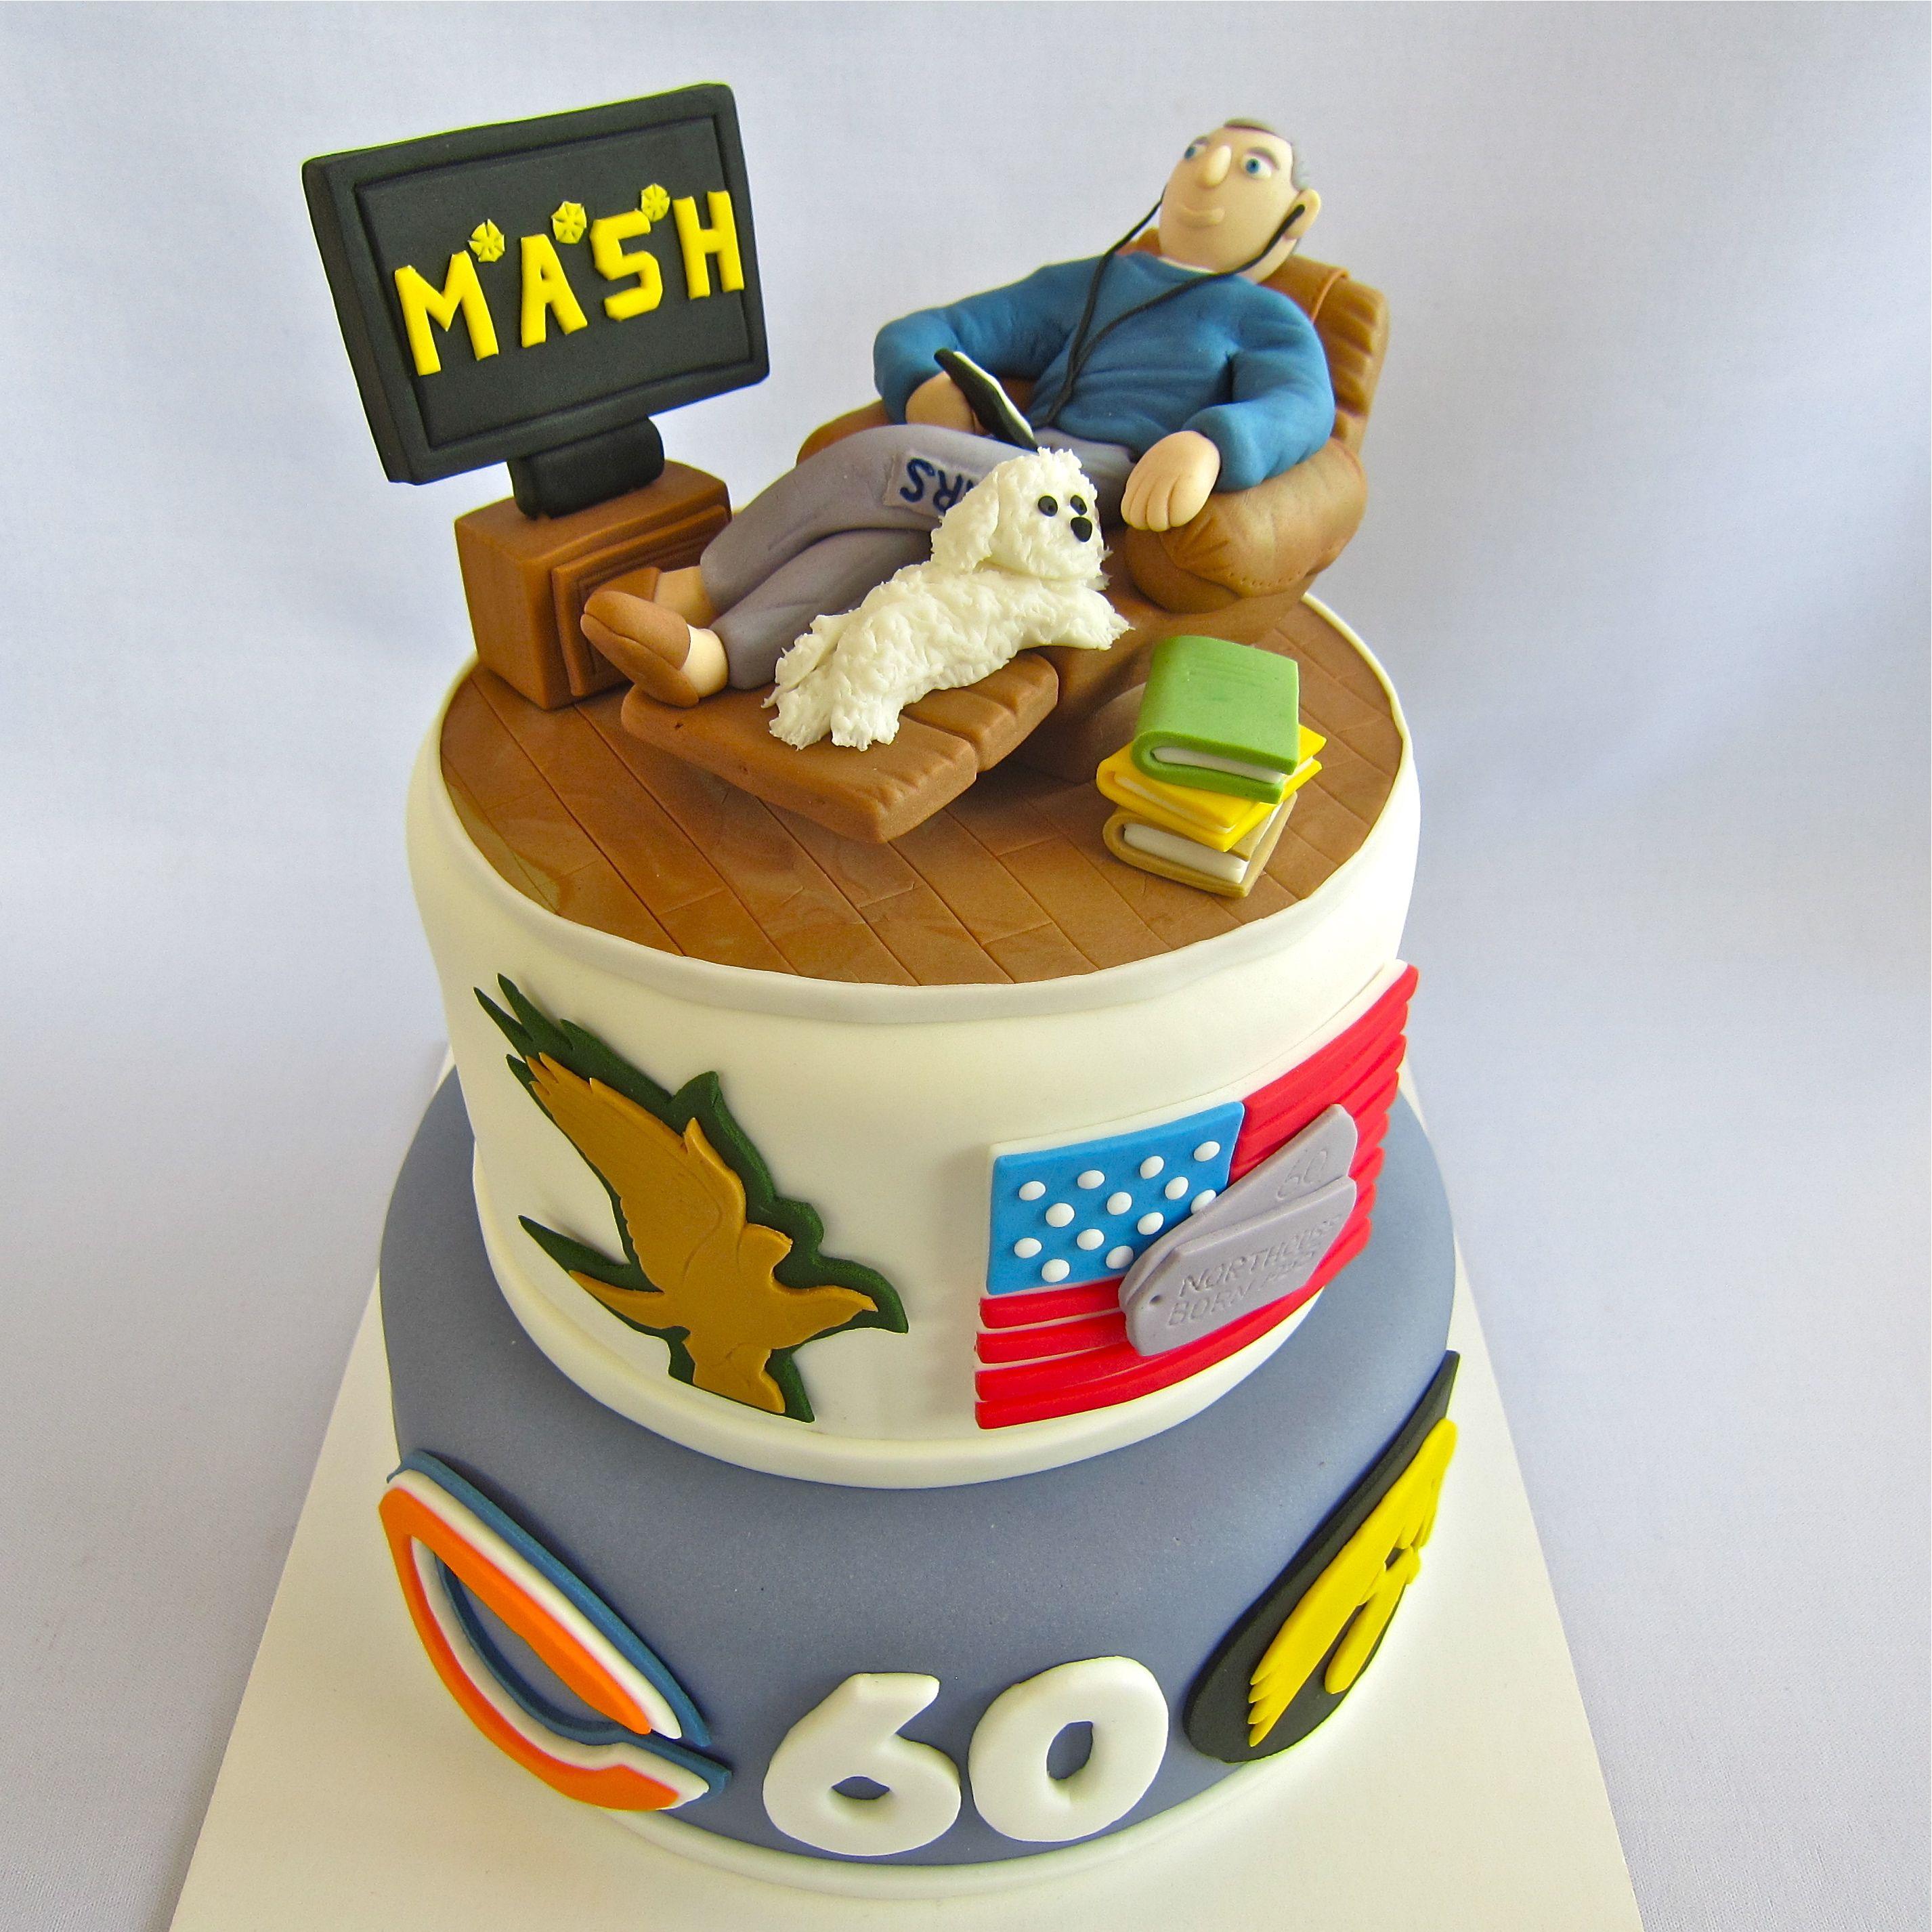 Personalized 60th Birthday Cake 60th birthday cakes